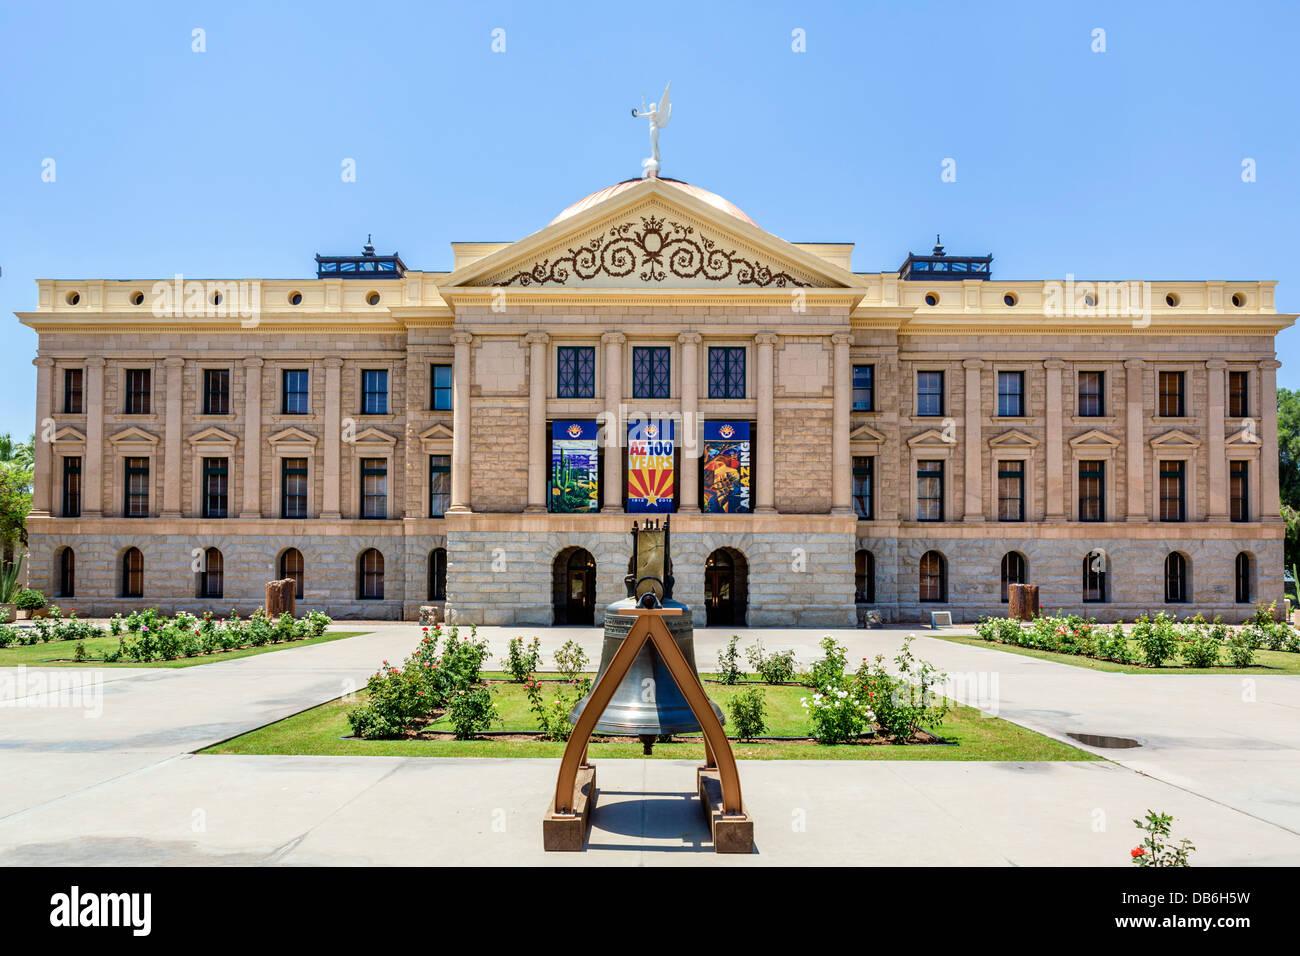 Das Arizona State Capitol Gebäude, Phoenix, Arizona, USA Stockbild